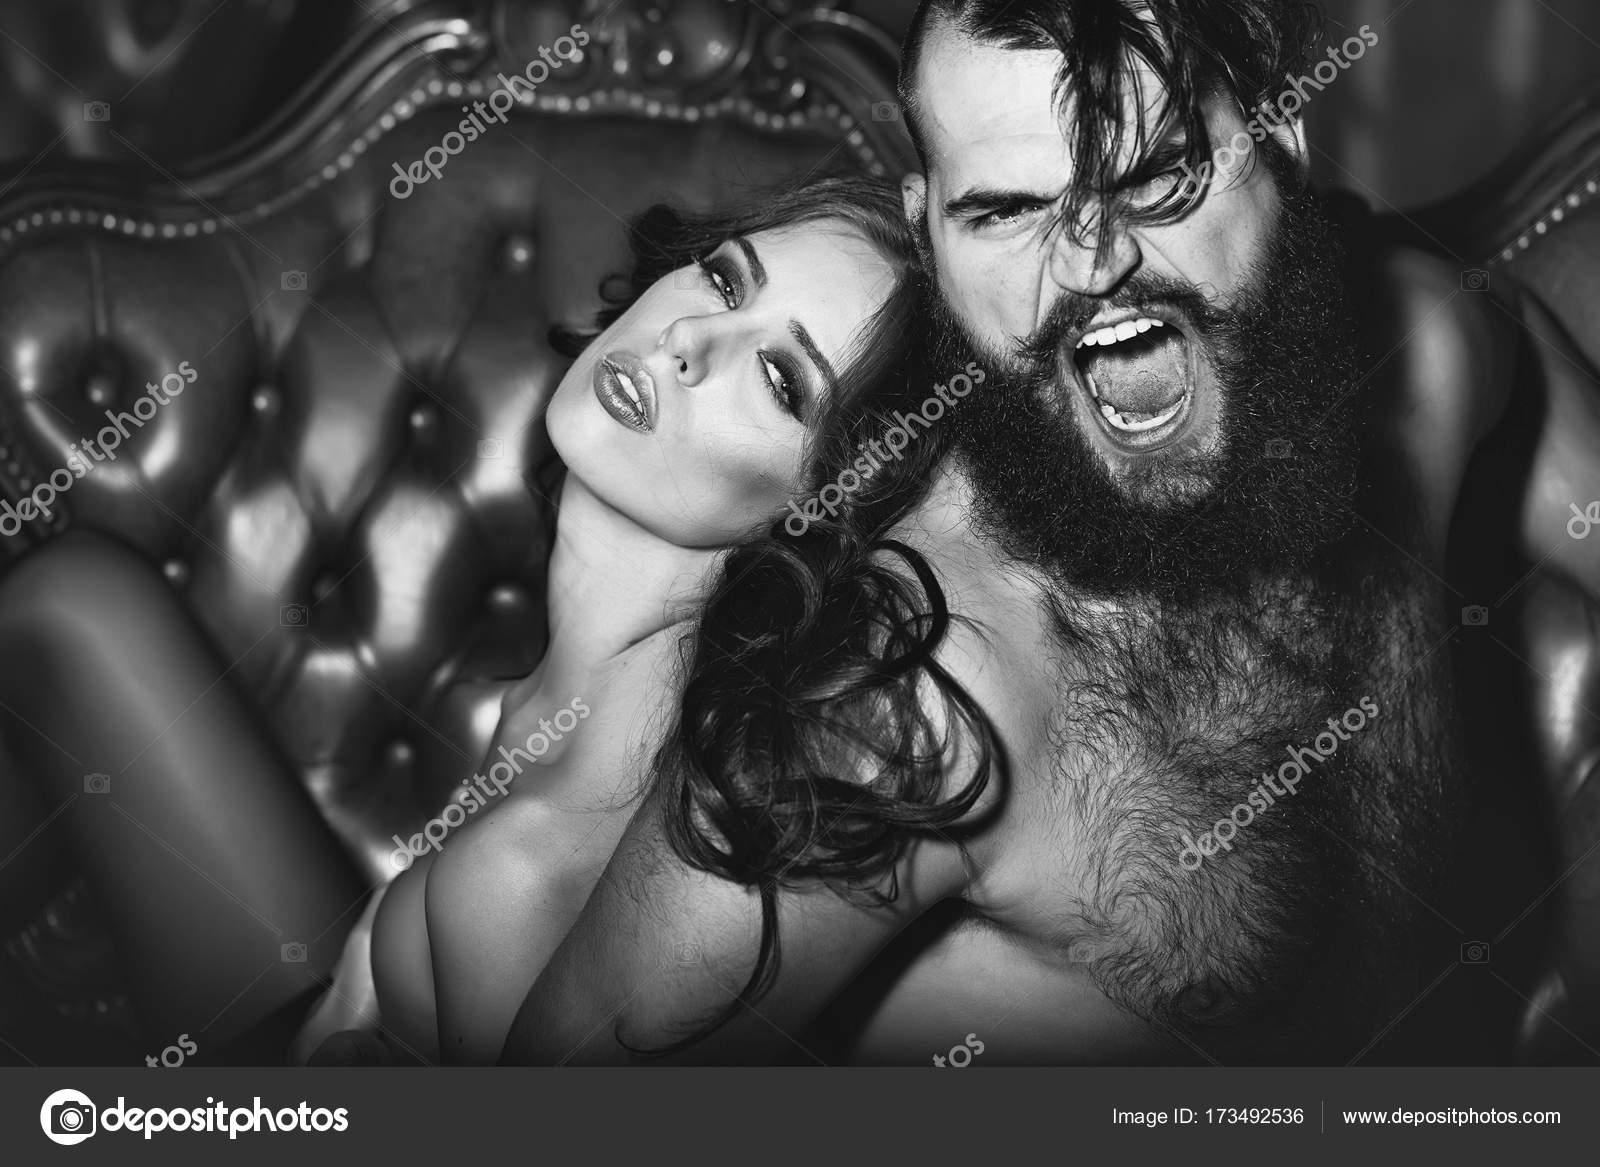 seksualniy-muzhik-i-zhenshina-foto-porno-dagestana-video